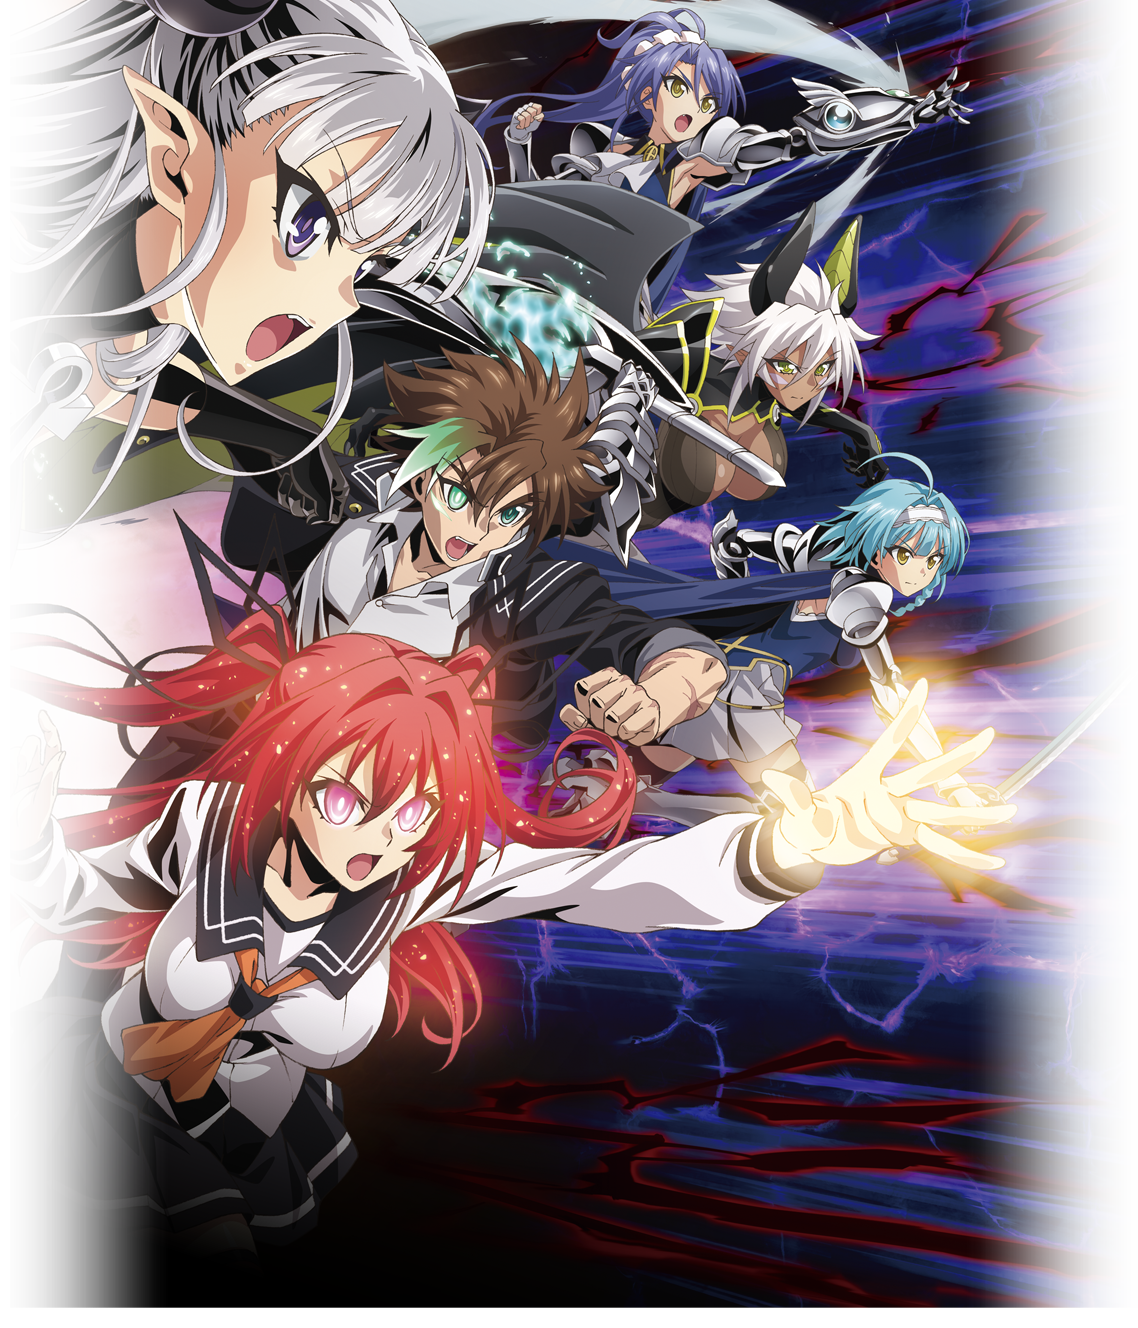 Shinmai Maou no Testament Burst anime visual 2